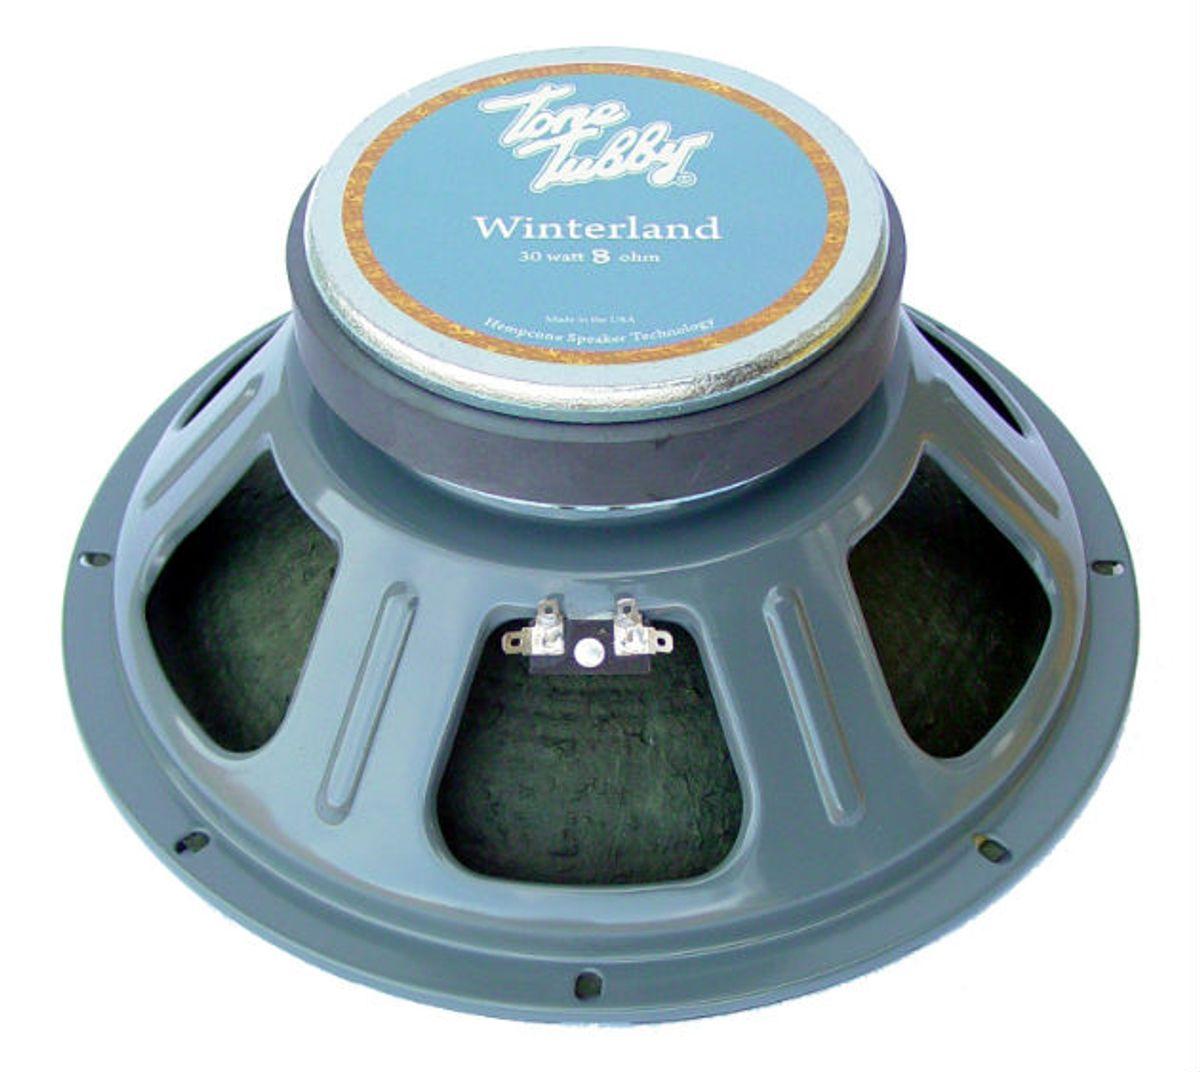 Tone Tubby Introduces the Winterland Ceramic Magnet Speaker